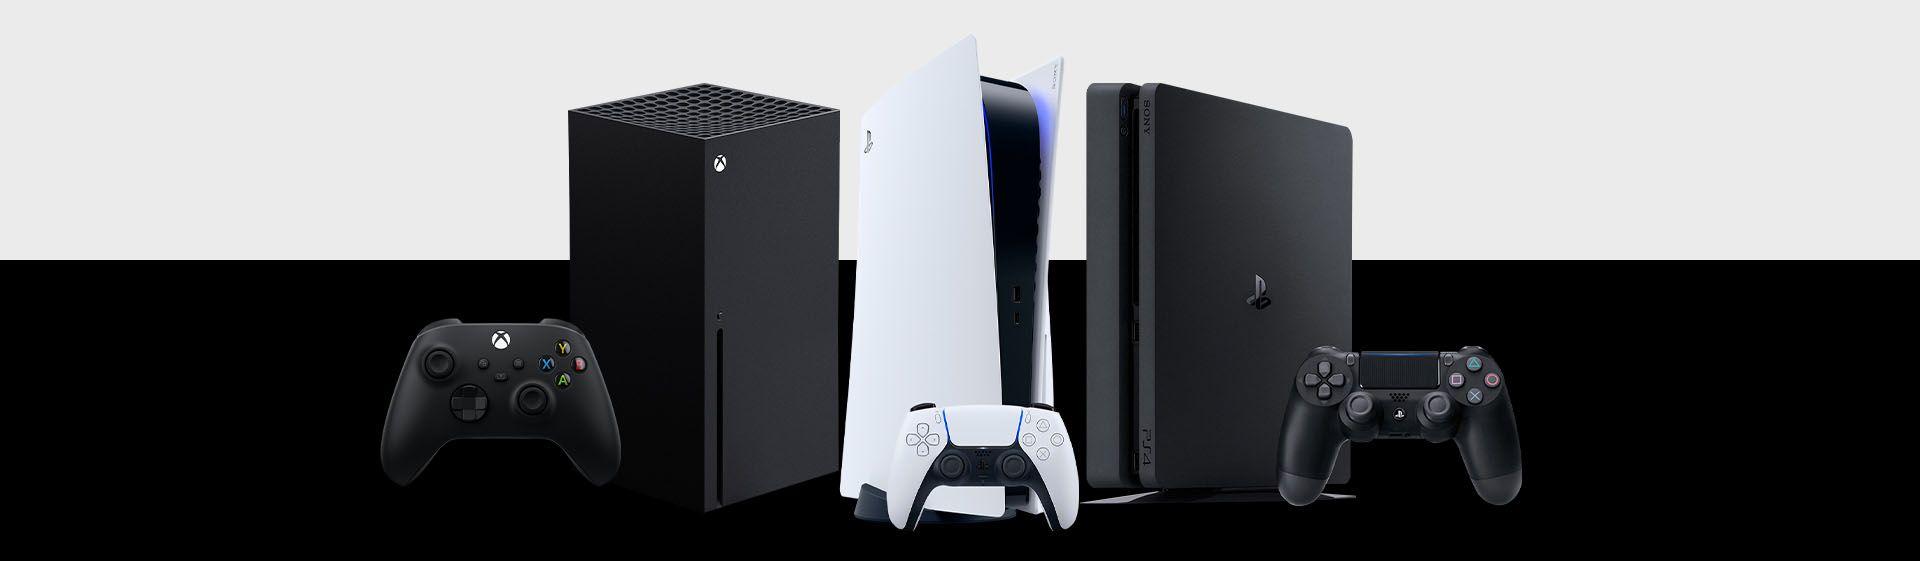 Como avaliamos consoles de videogame no Zoom